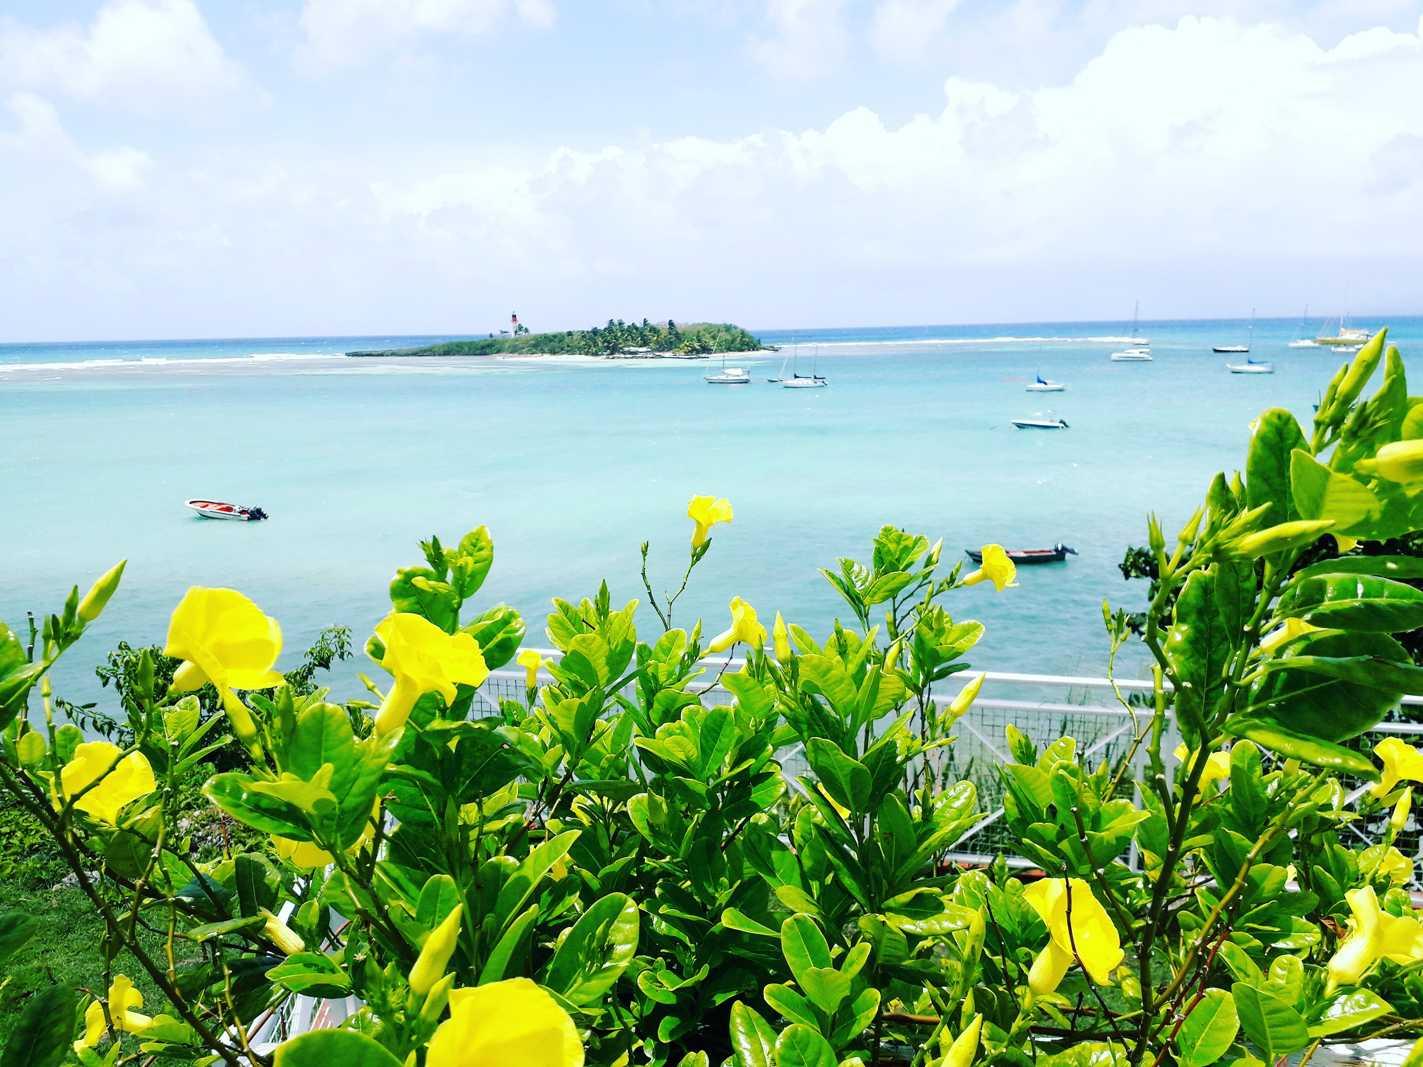 Plage Guadeloupe : îlet du Gosier